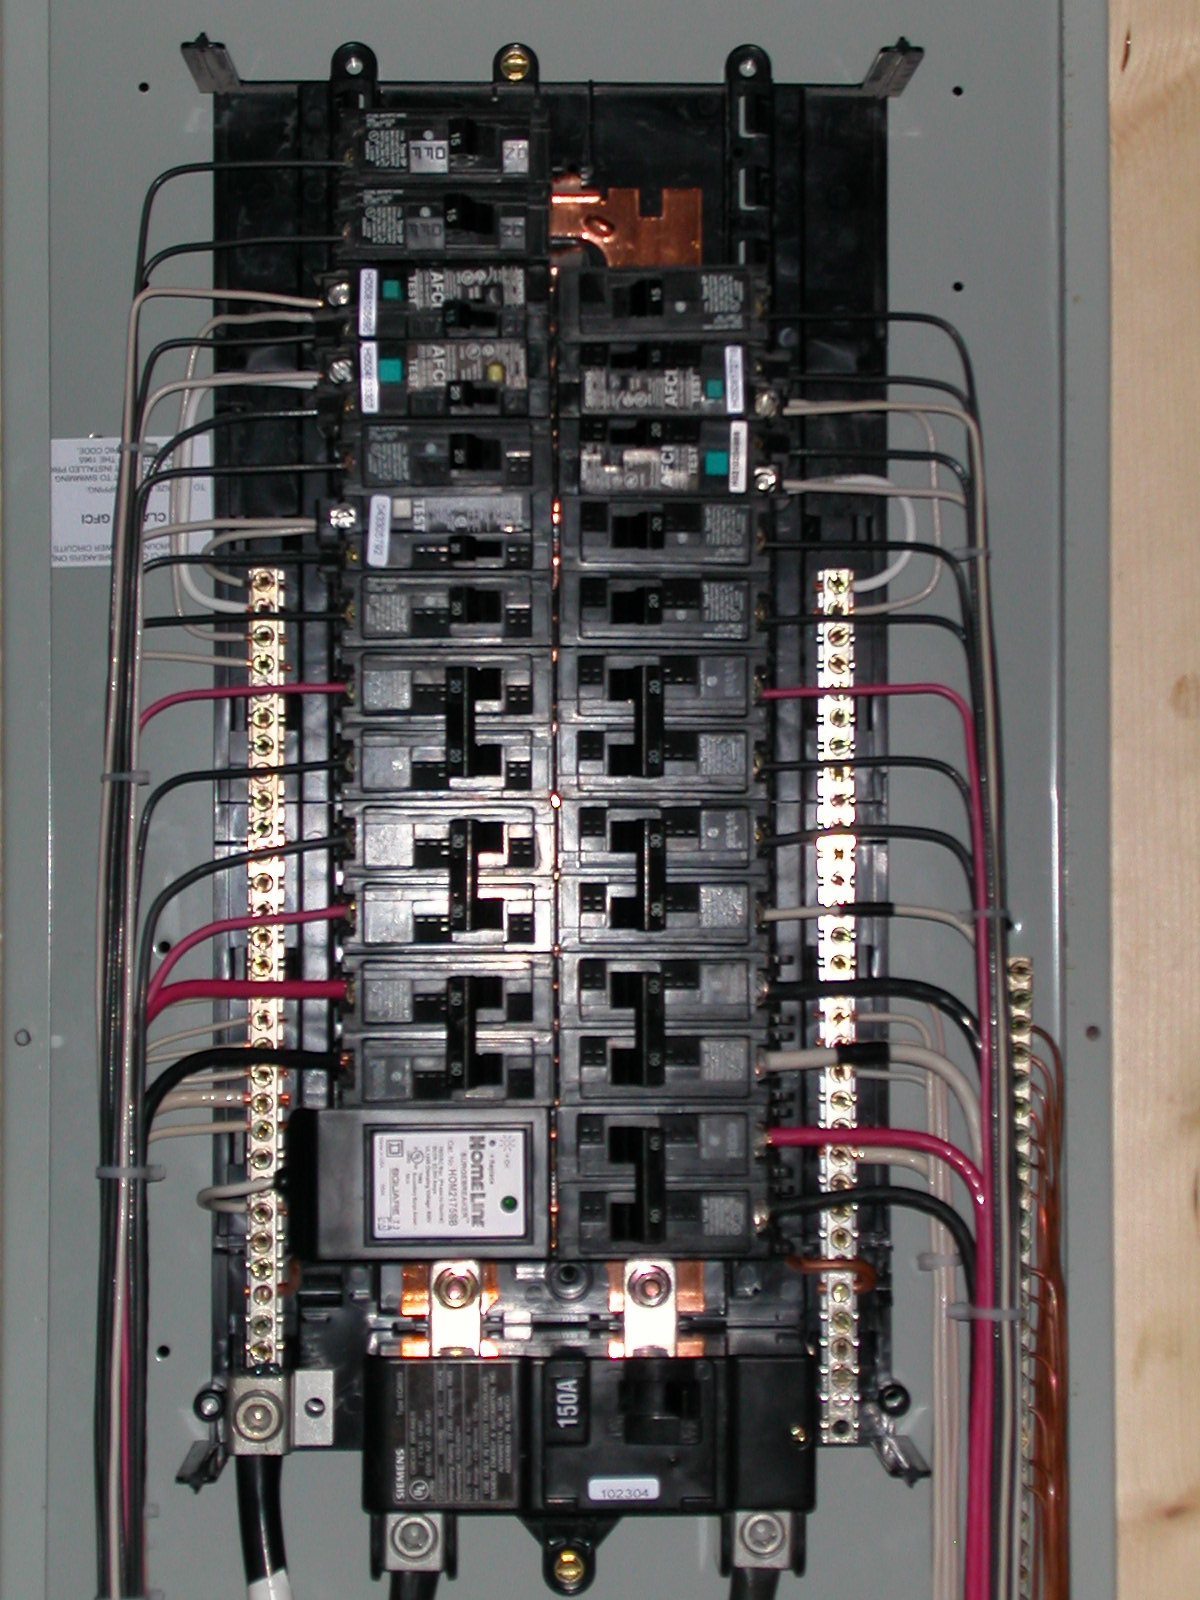 Gfci Circuit Breaker Wiring How To Wire A Gfci Breaker Spacarecom